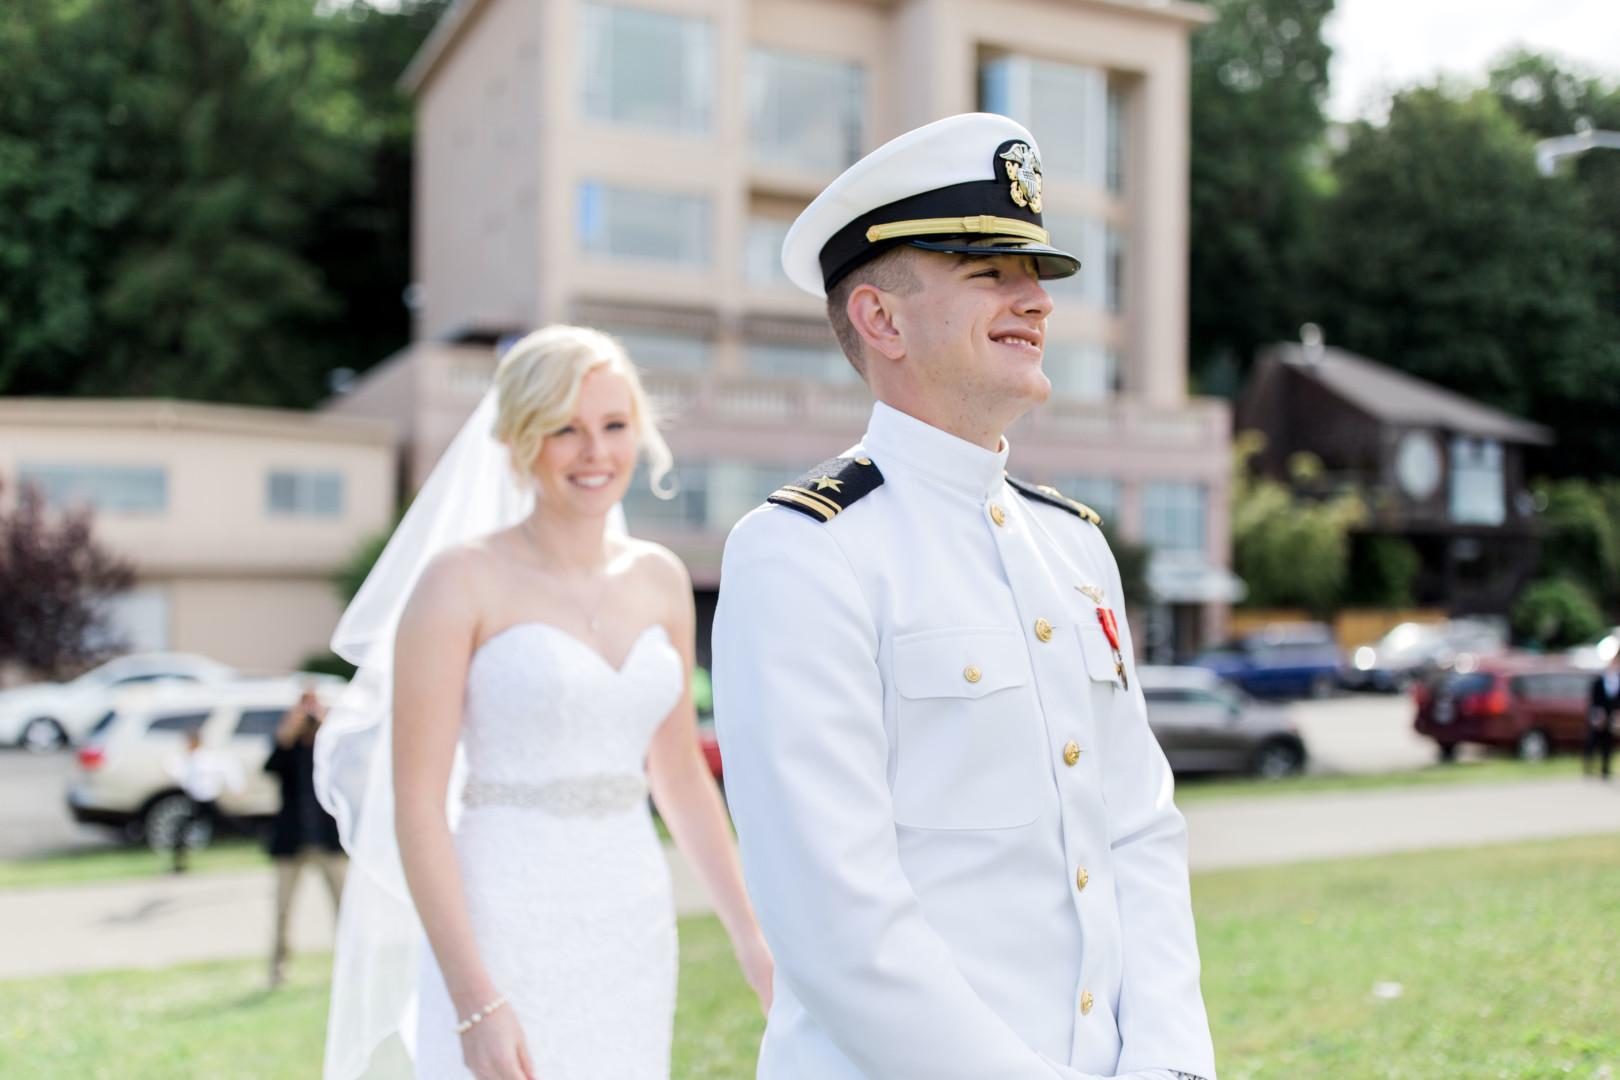 16-5-Looch-Lauren-Worl-Seattle-Wedding-Photography-Nicole-Barkis-Photographer-First-Look-27